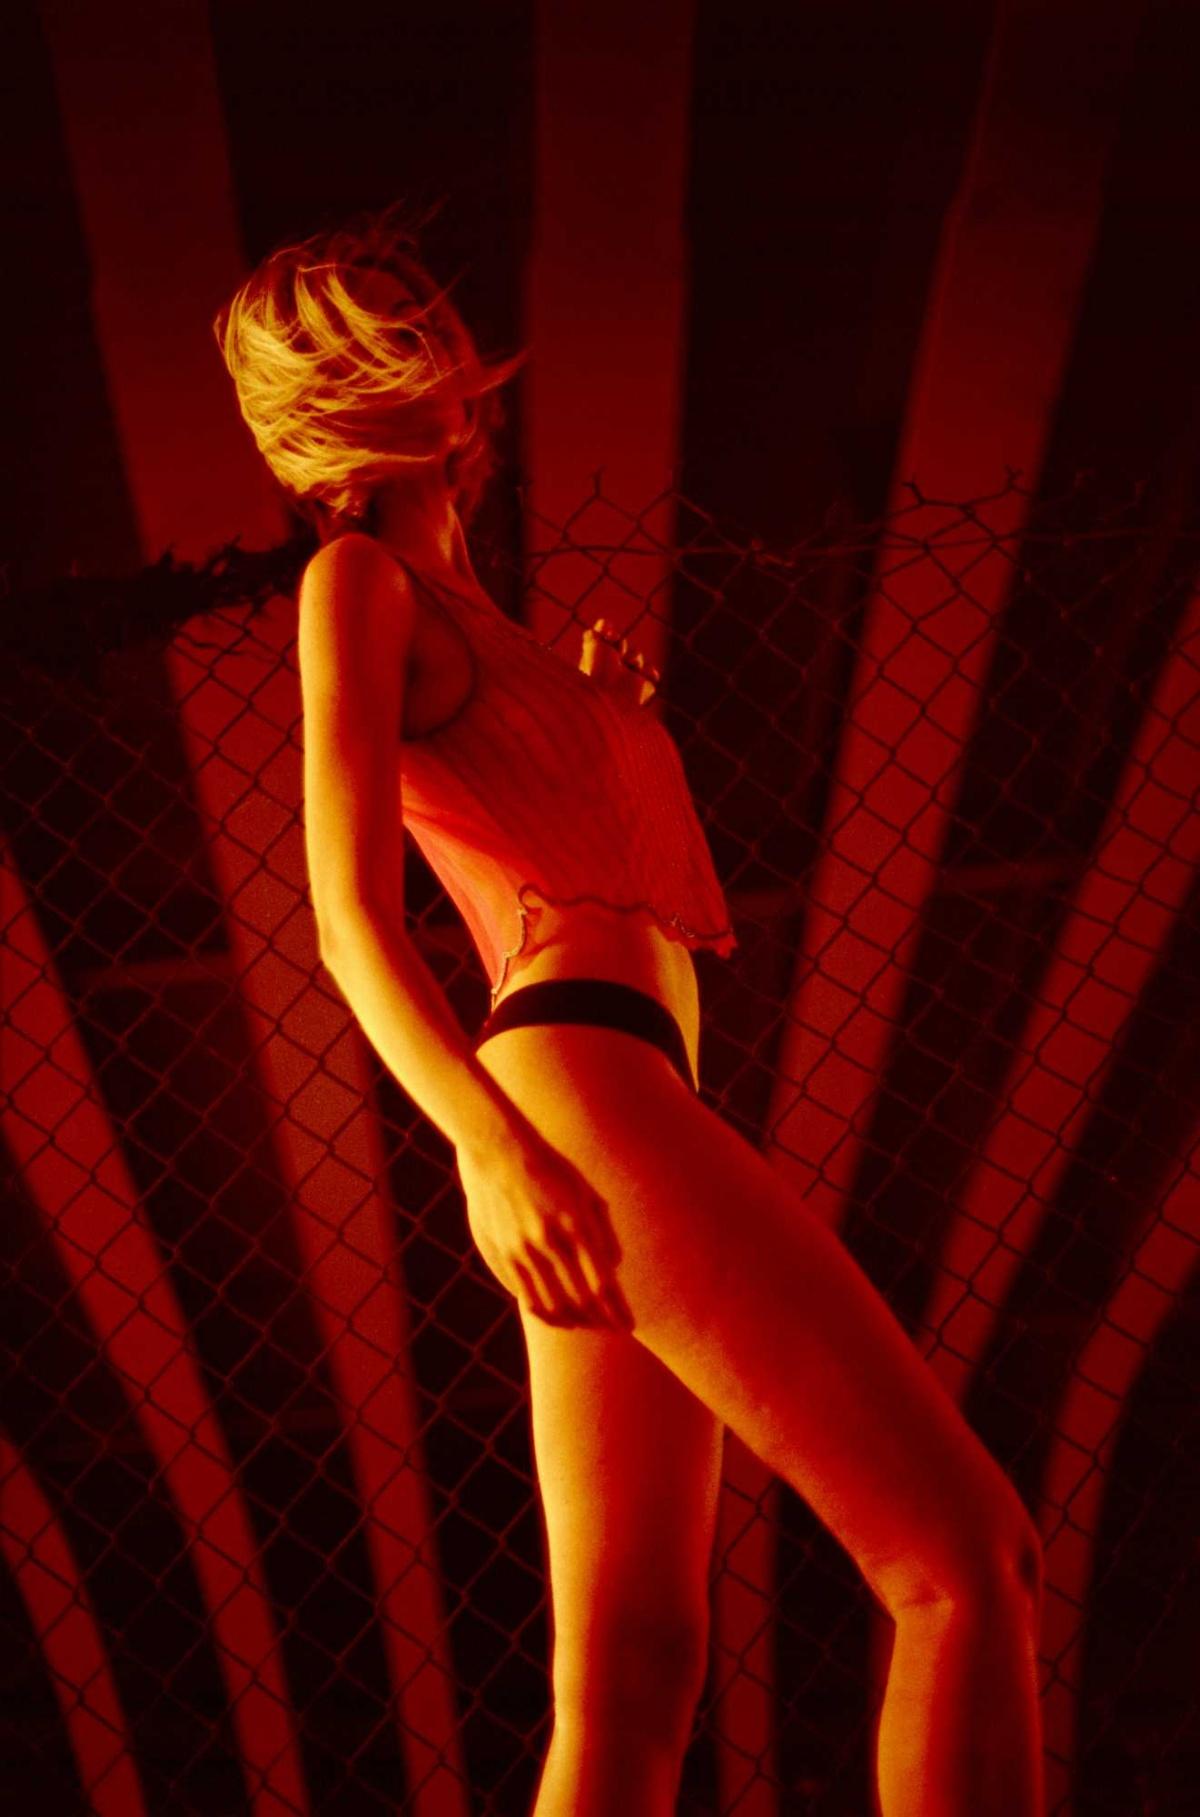 Anna Lisa Wagner nyc 35mm